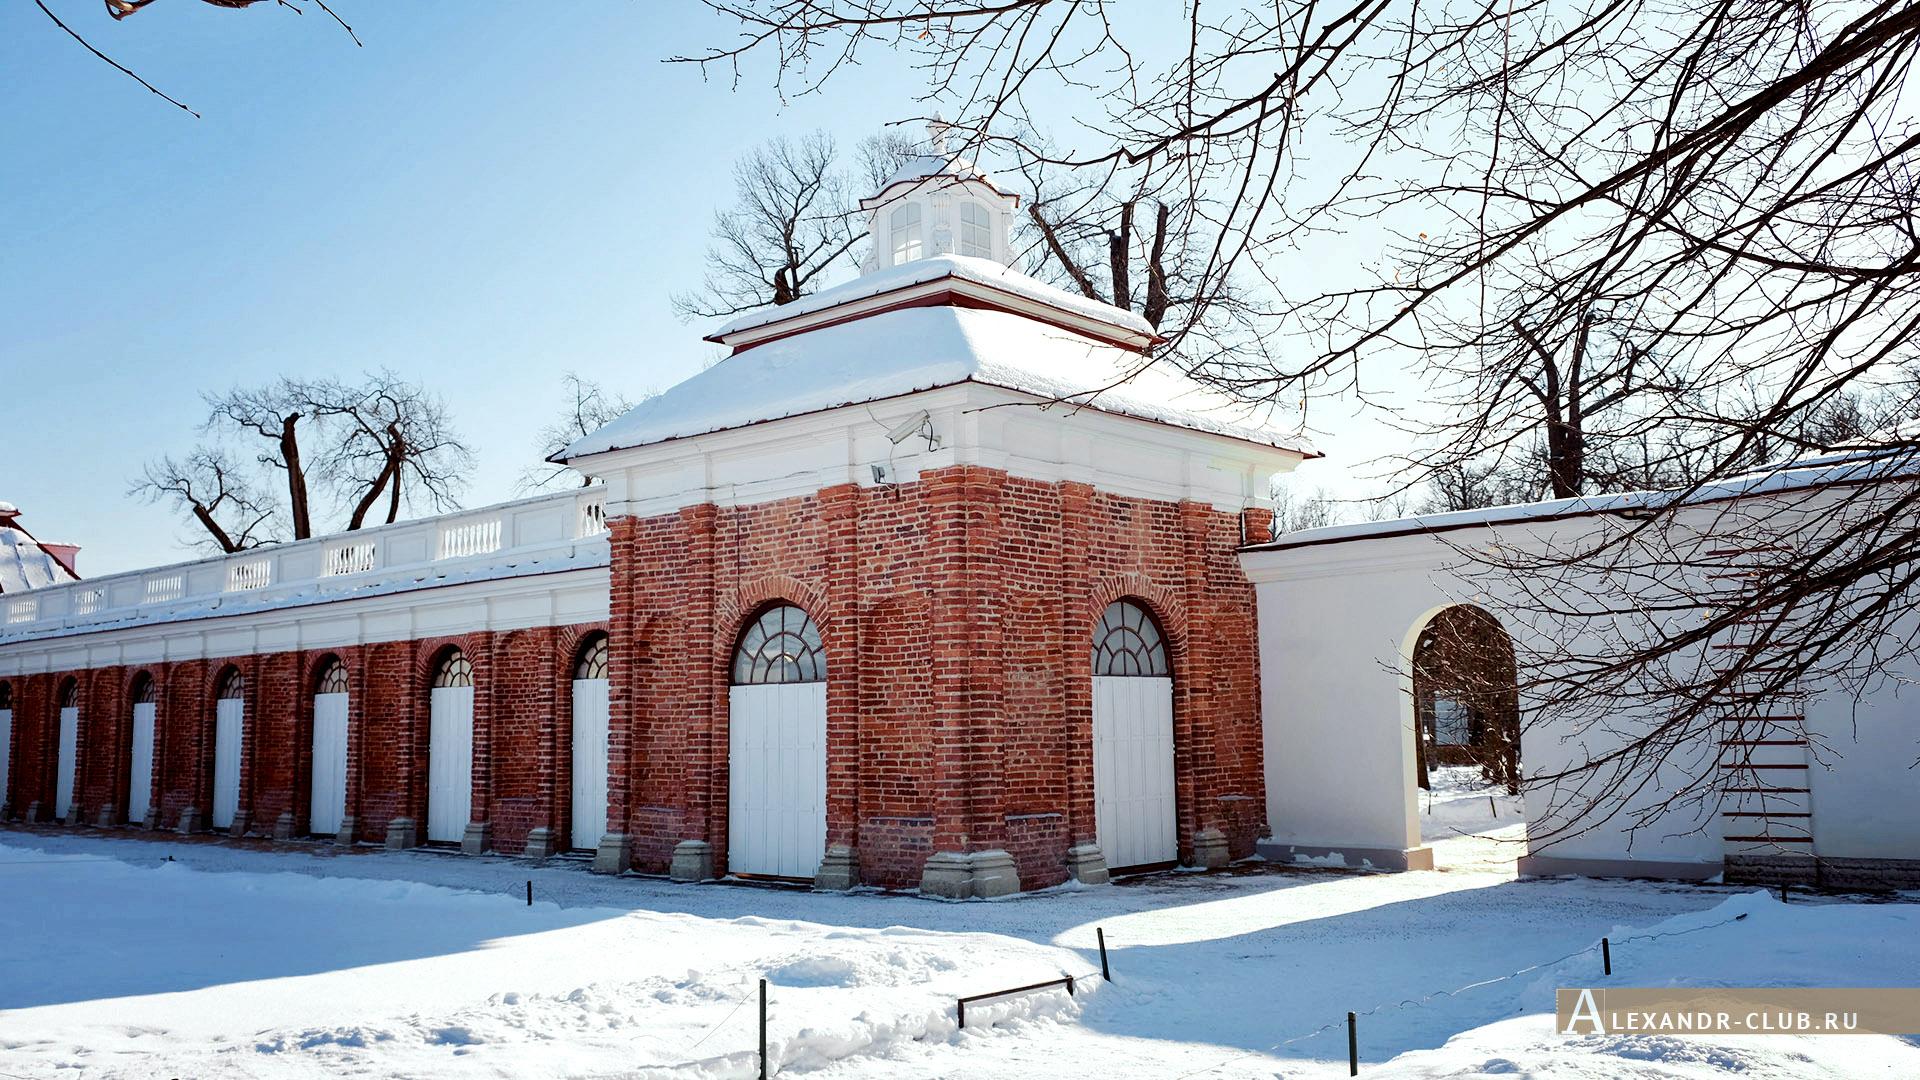 Петергоф, зима, Нижний парк, дворец «Монплезир» – 2